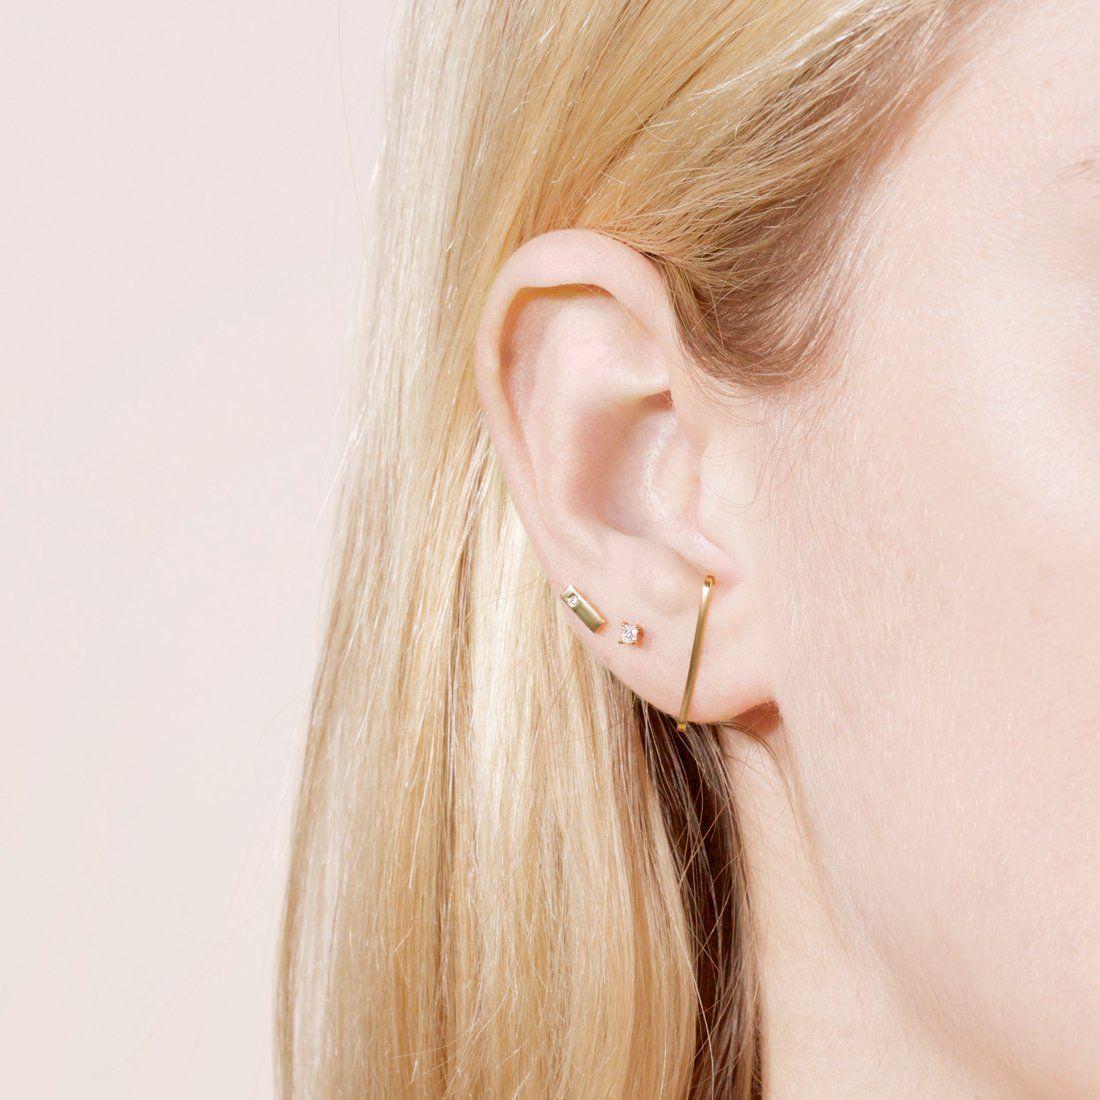 382095858 ... multiple ear piercings. Gold Suspender Earring – STONE AND STRAND